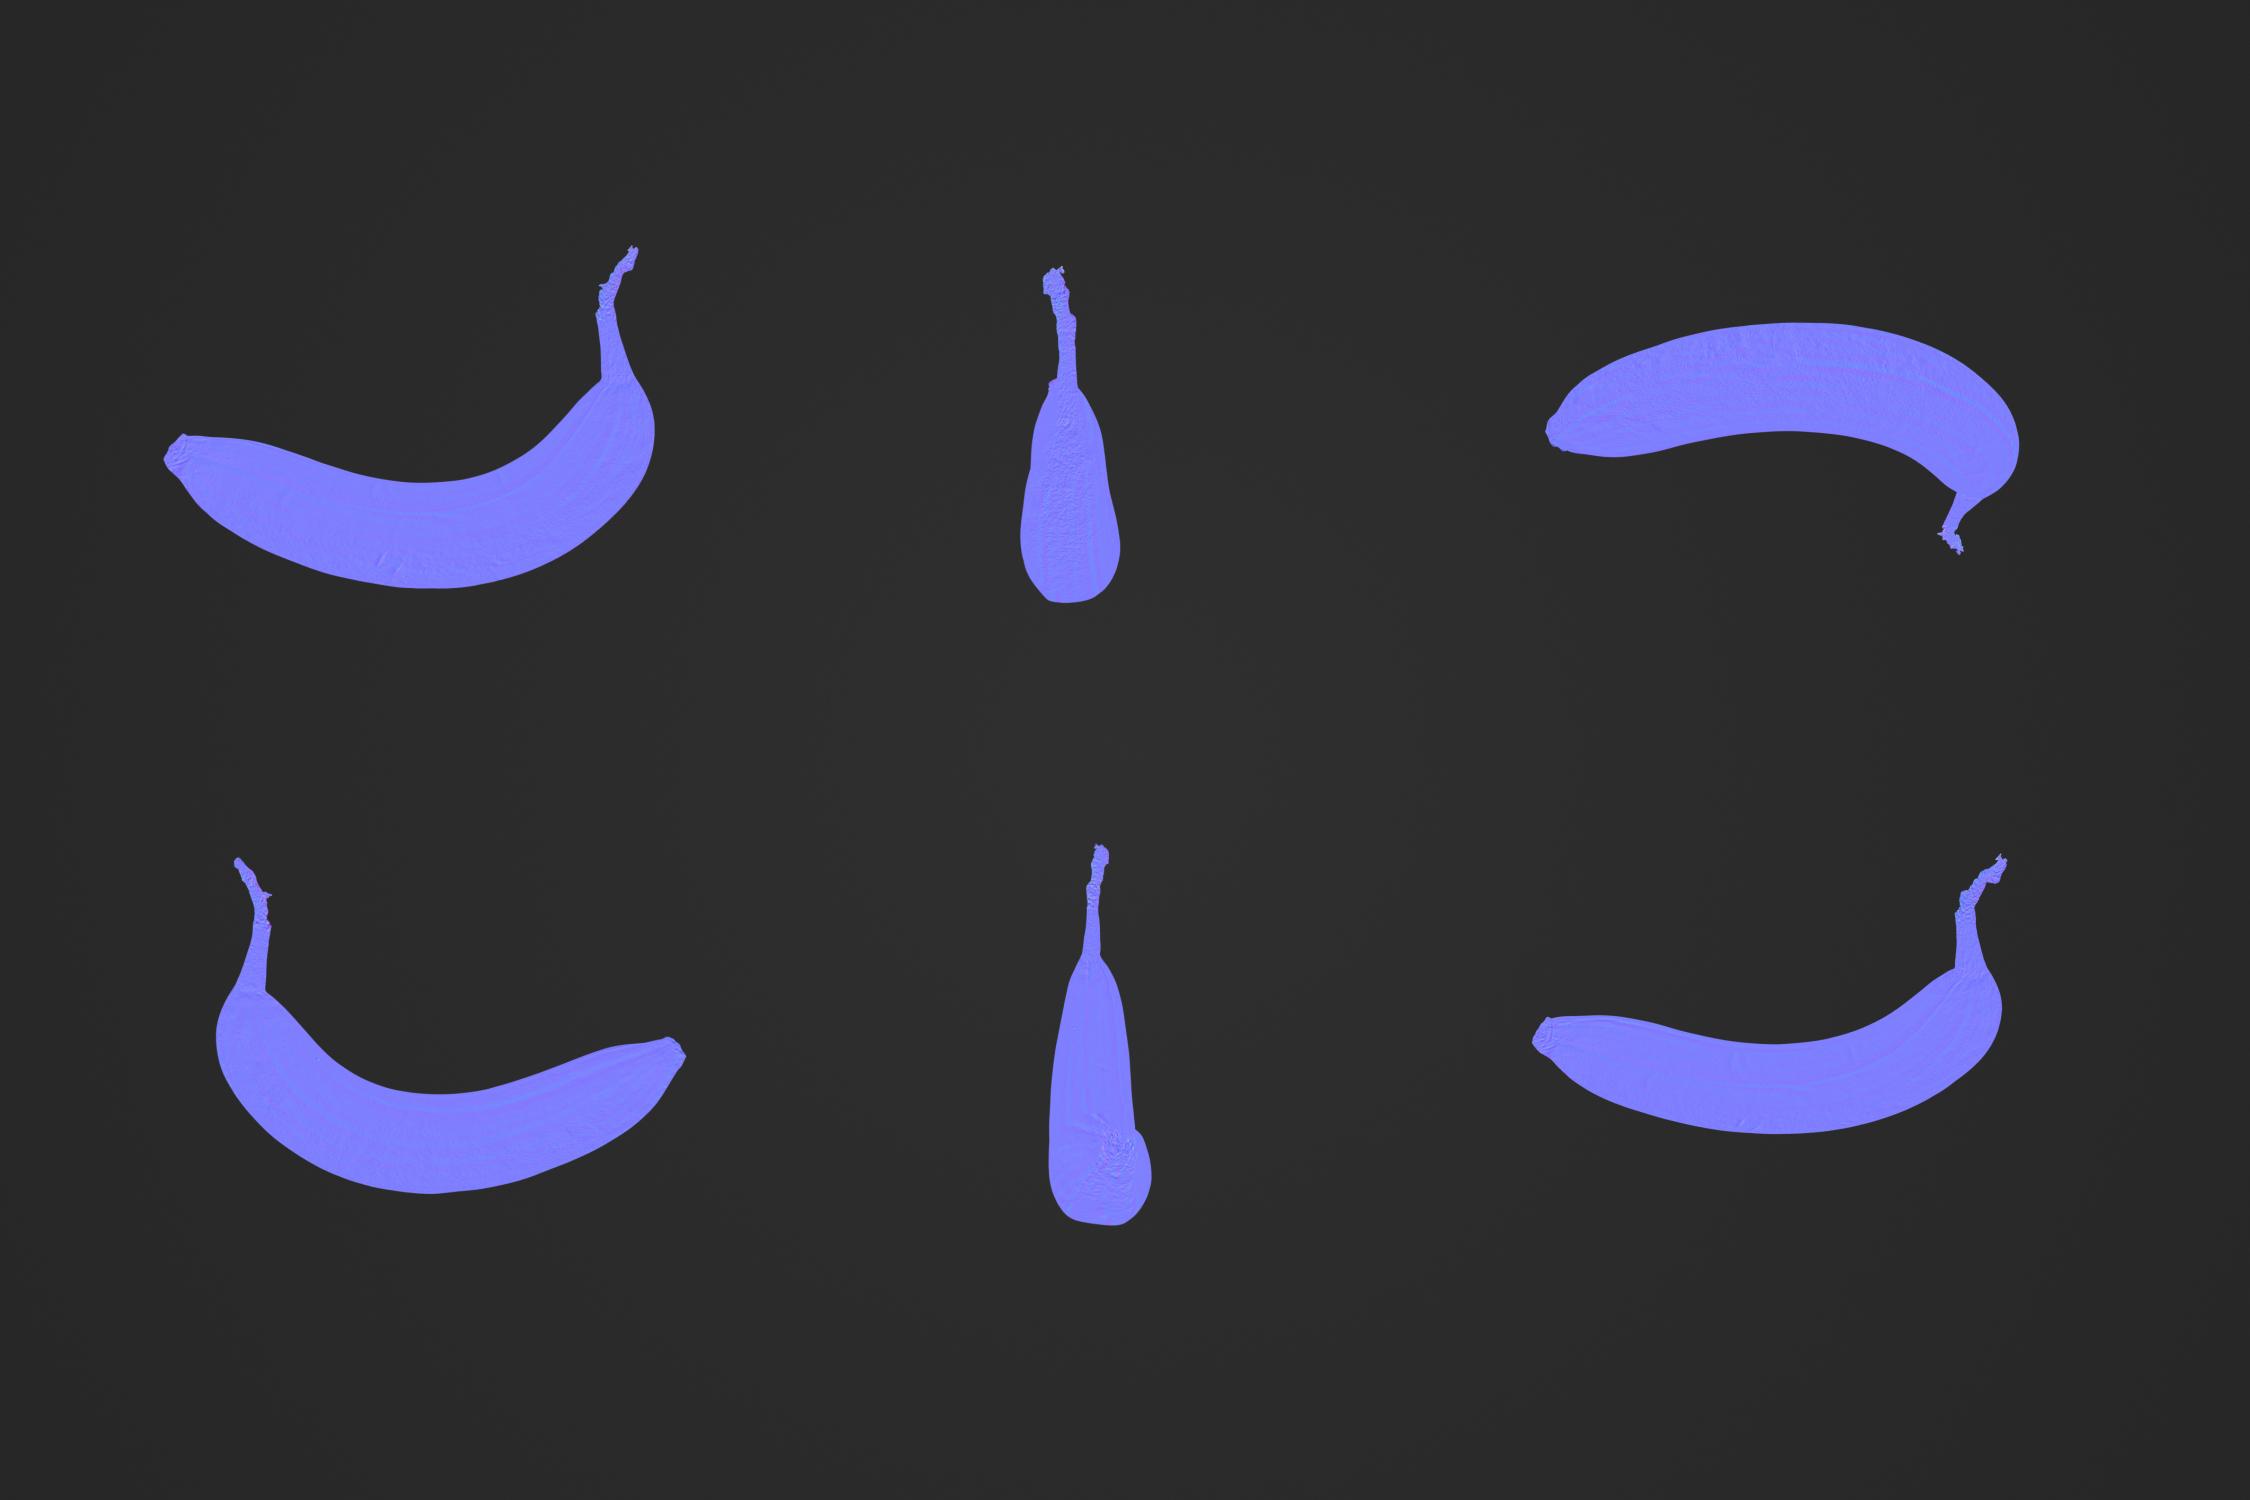 Unripe_Banana_1_3.jpg